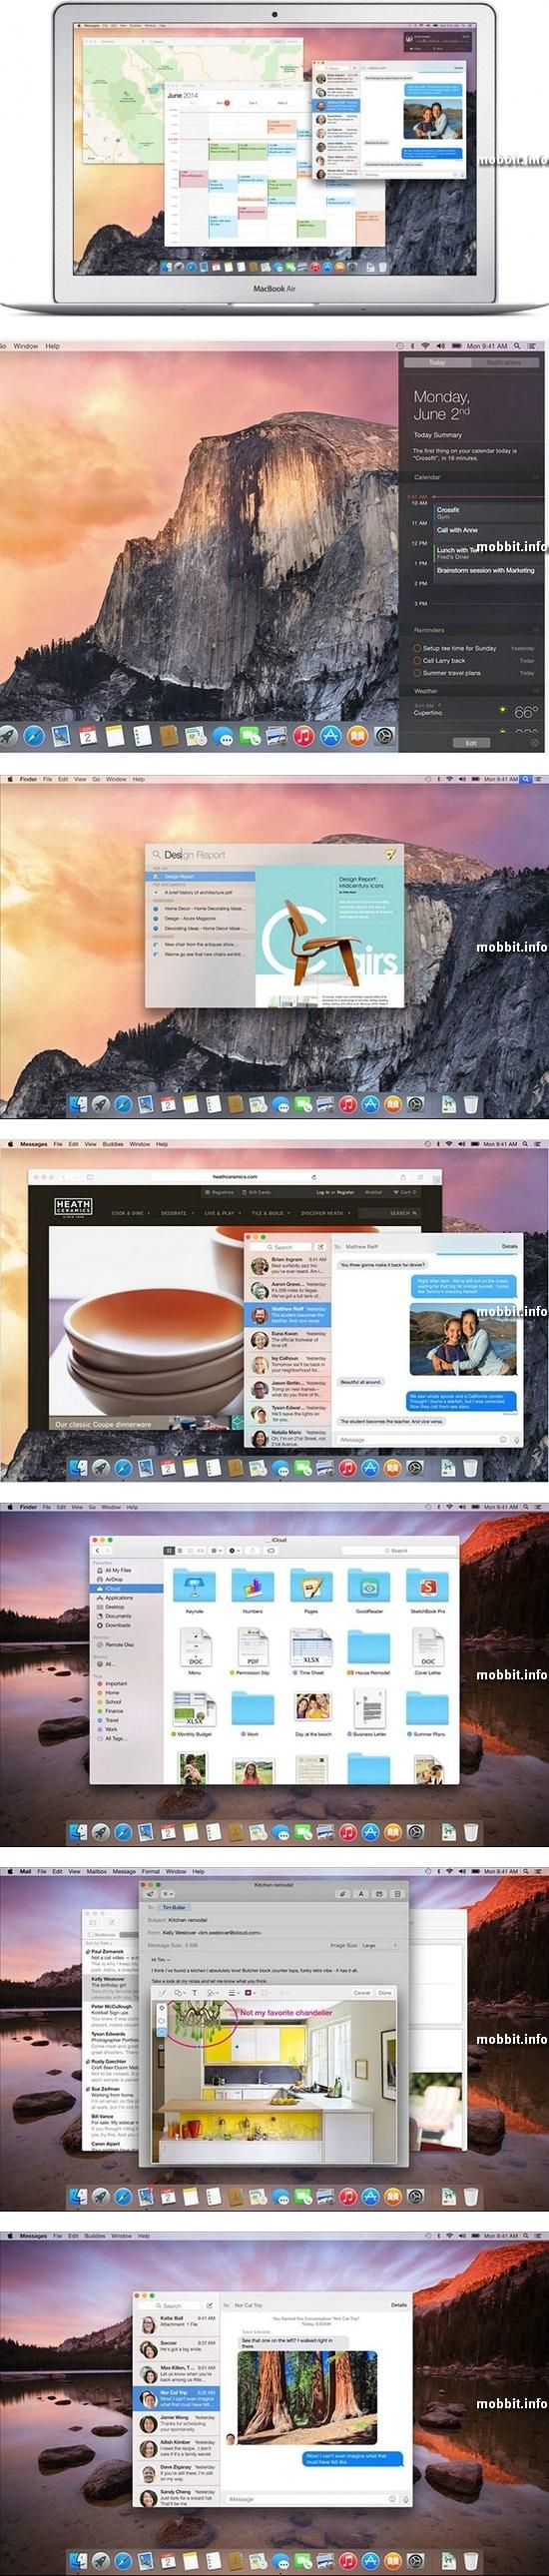 Apple OS X 10.10 Yosemite